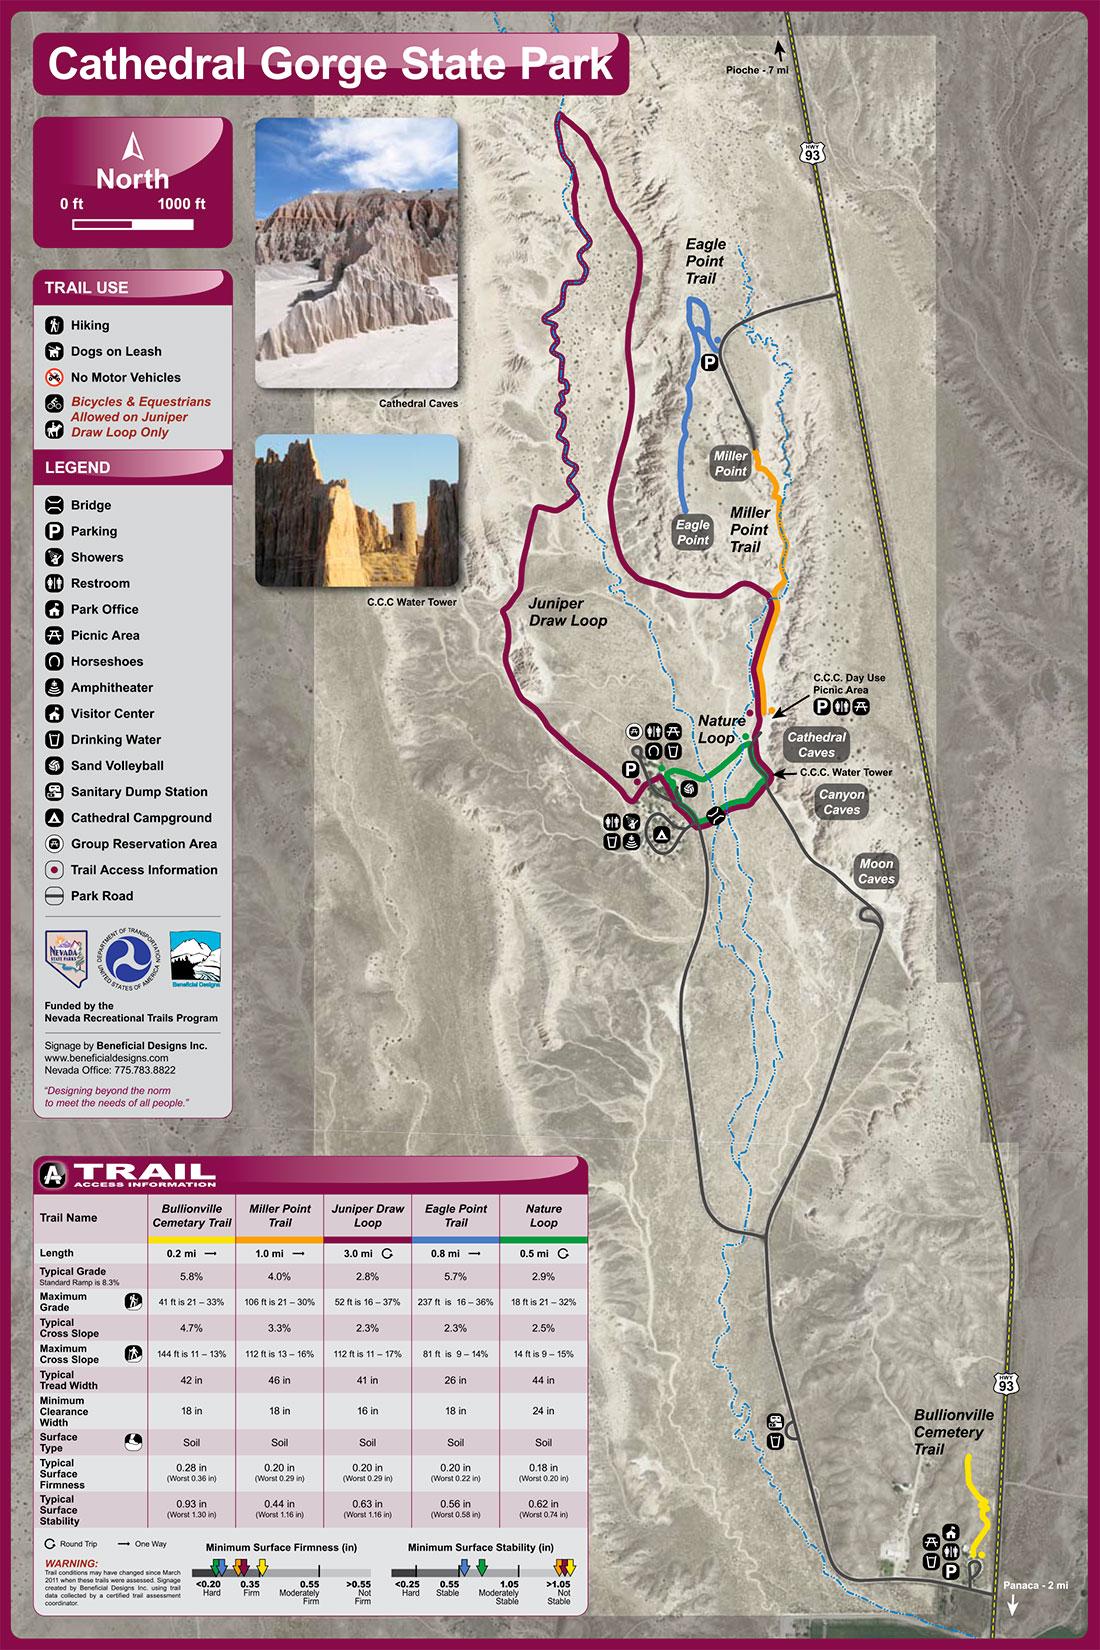 Carte de Cathedral Gorge State Park